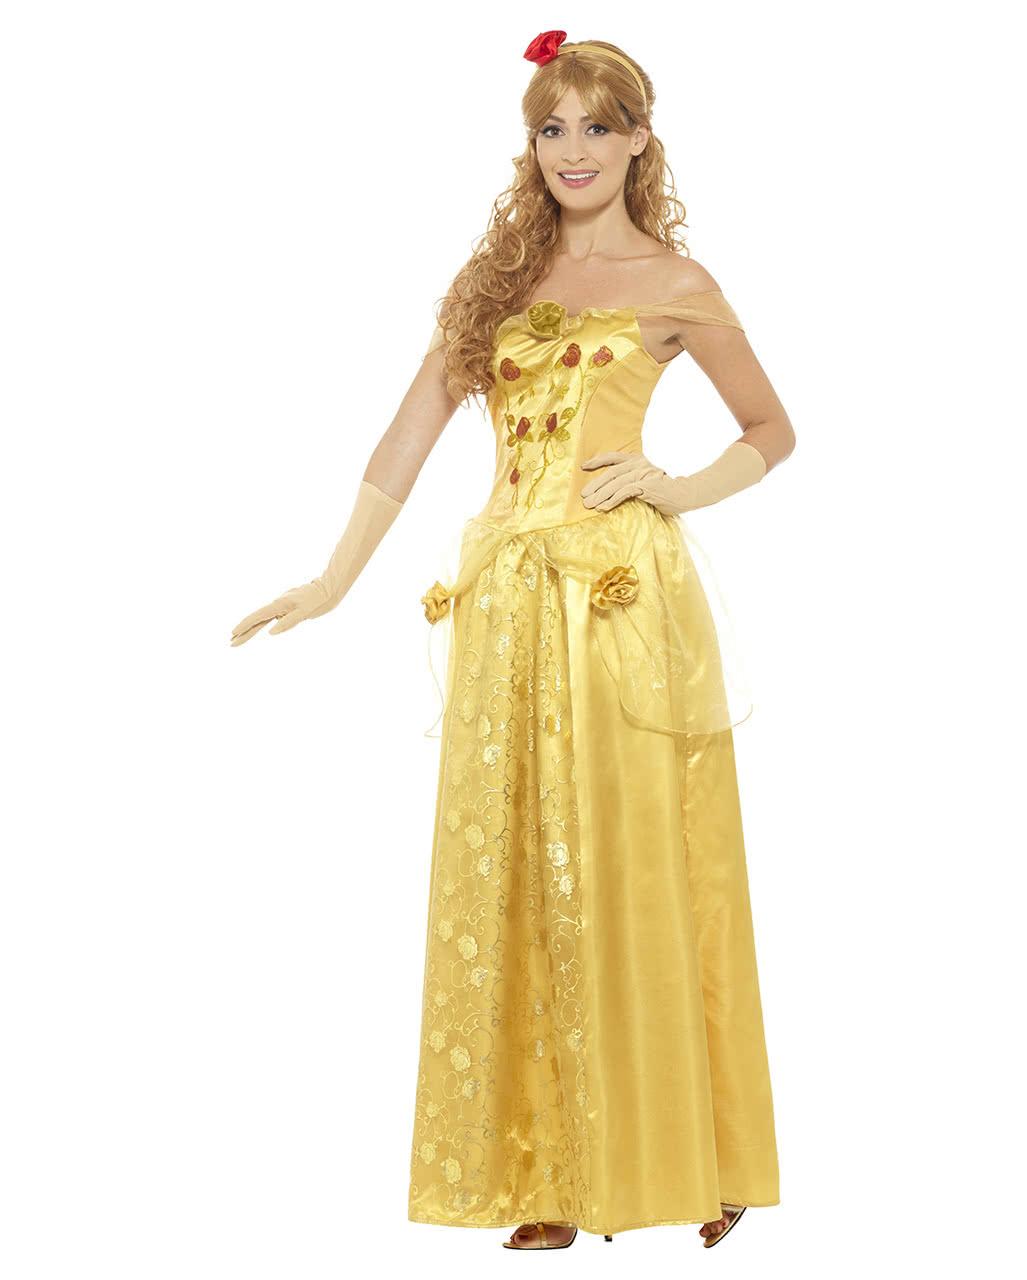 Golden Princess Costume | Belle | horror-shop.com